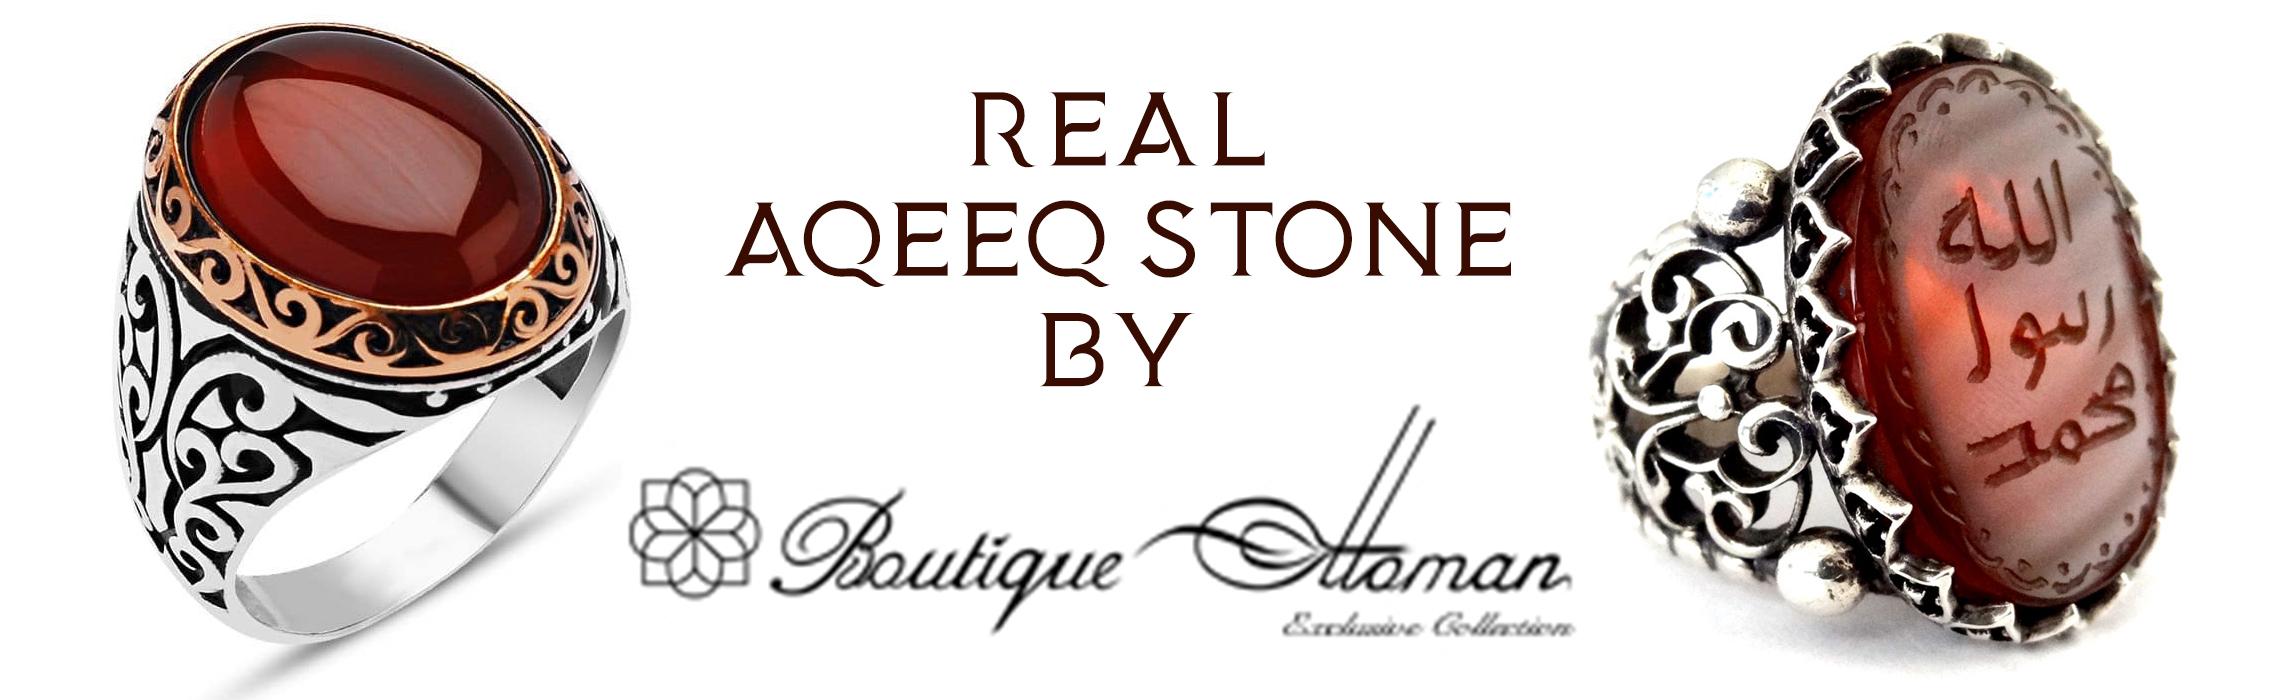 Real Aqeeq Stone